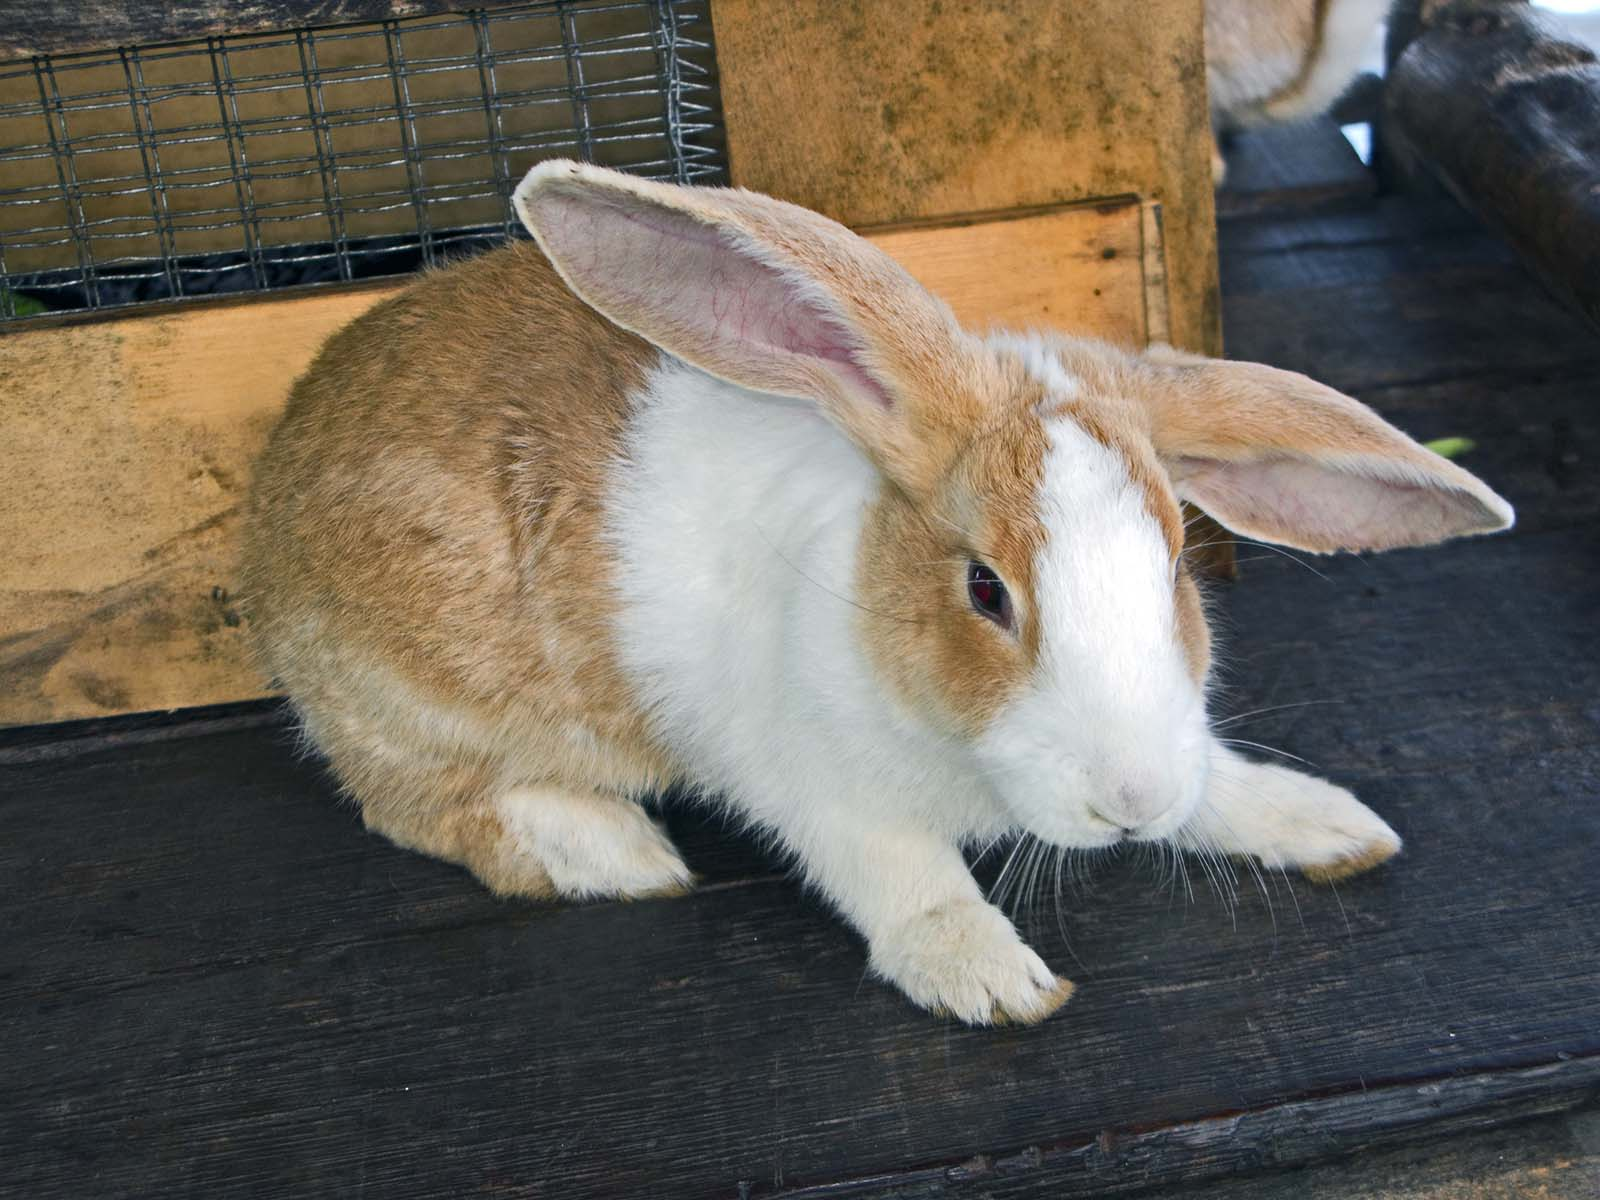 Dwarf Rabbits Floppy Ears   1600 x 1200 jpeg 180kB